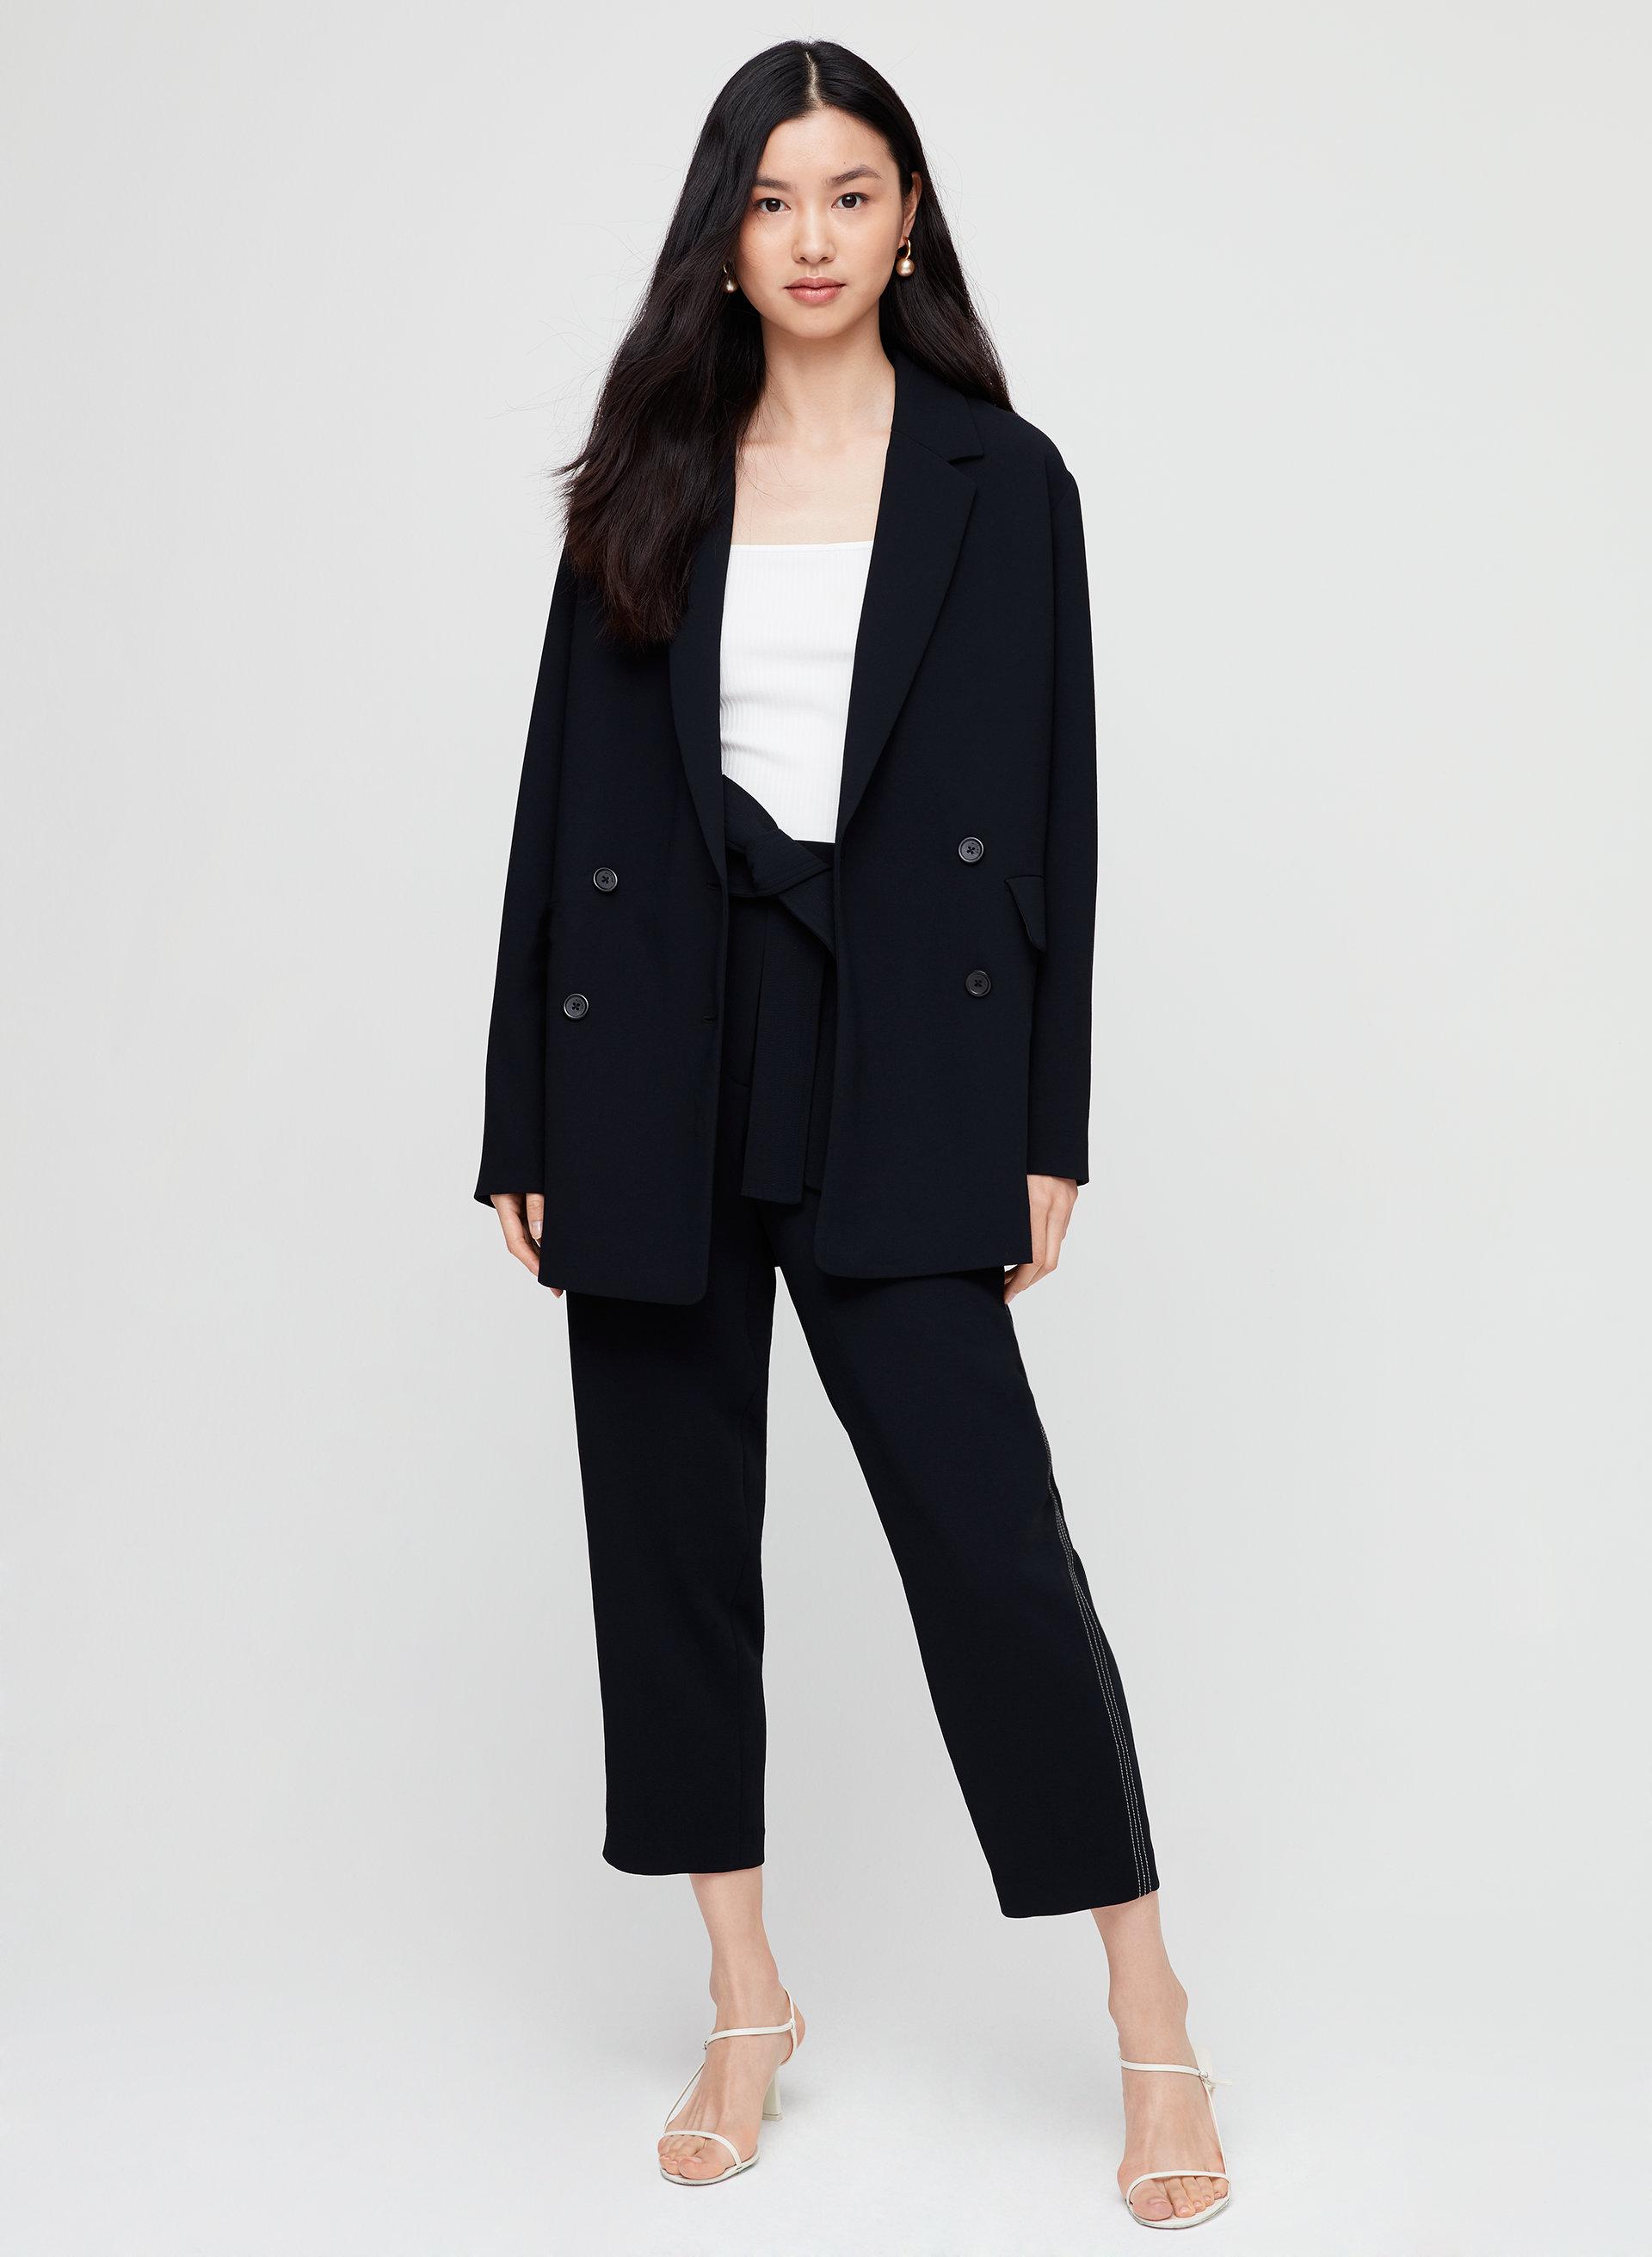 ee9cbffe cherrelle jacket Oversized, double-breasted blazer